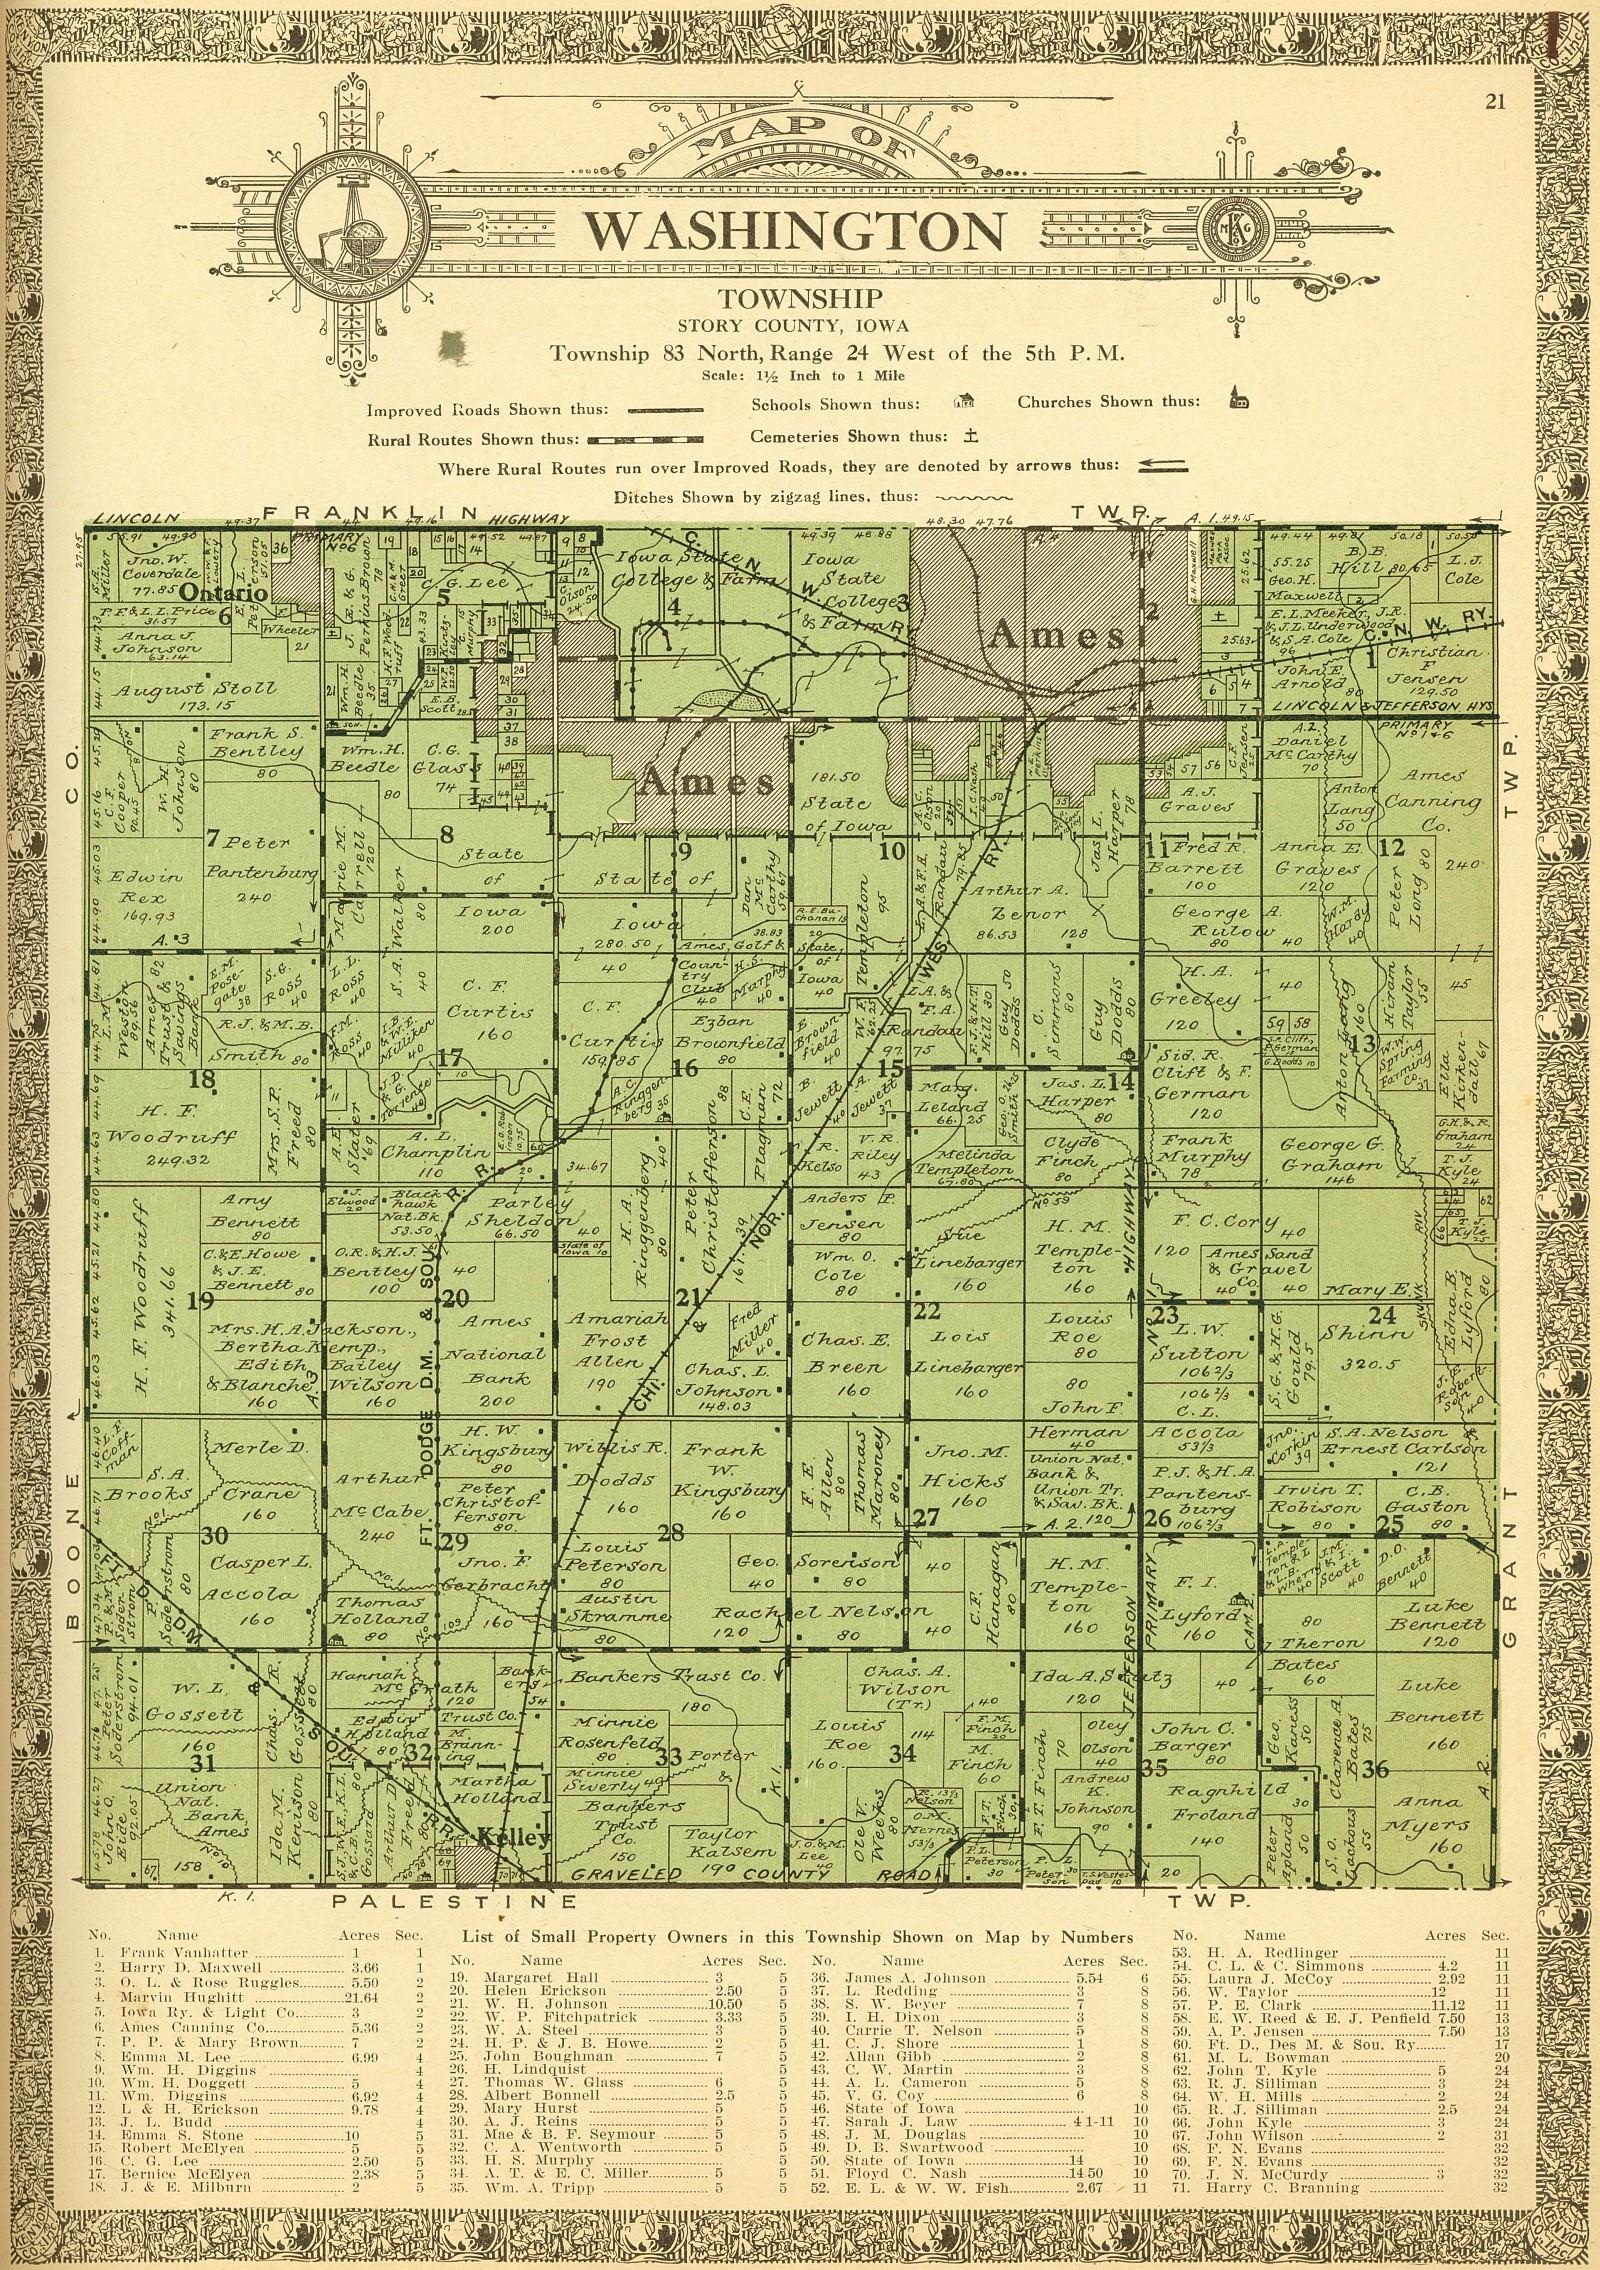 Washington County Iowa Map.1926 Atlas And Plat Book Of Story County Iowa Ames Historical Society